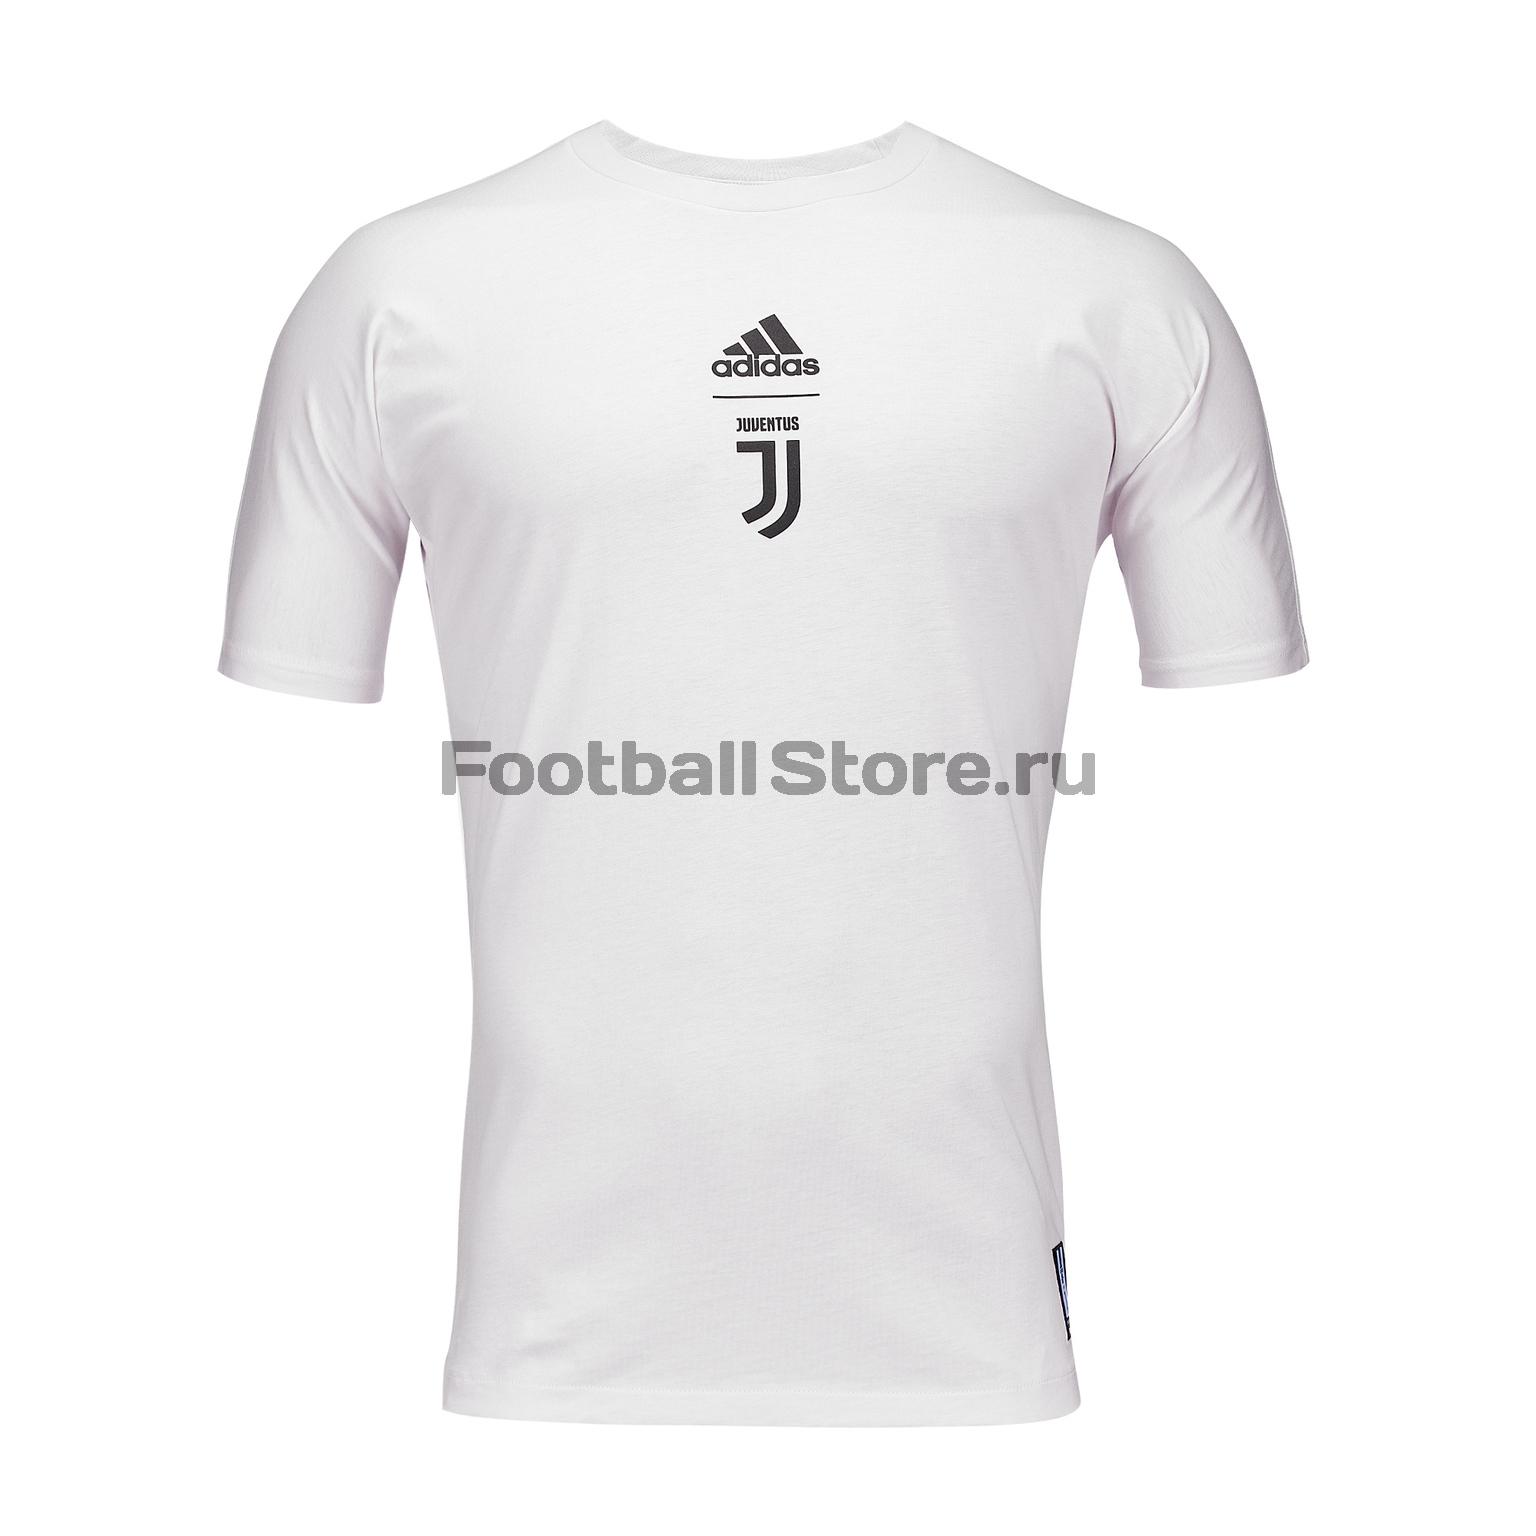 Футболка тренировочная Adidas Juventus SSP Tee DP3925 рюкзак adidas juventus 2018 19